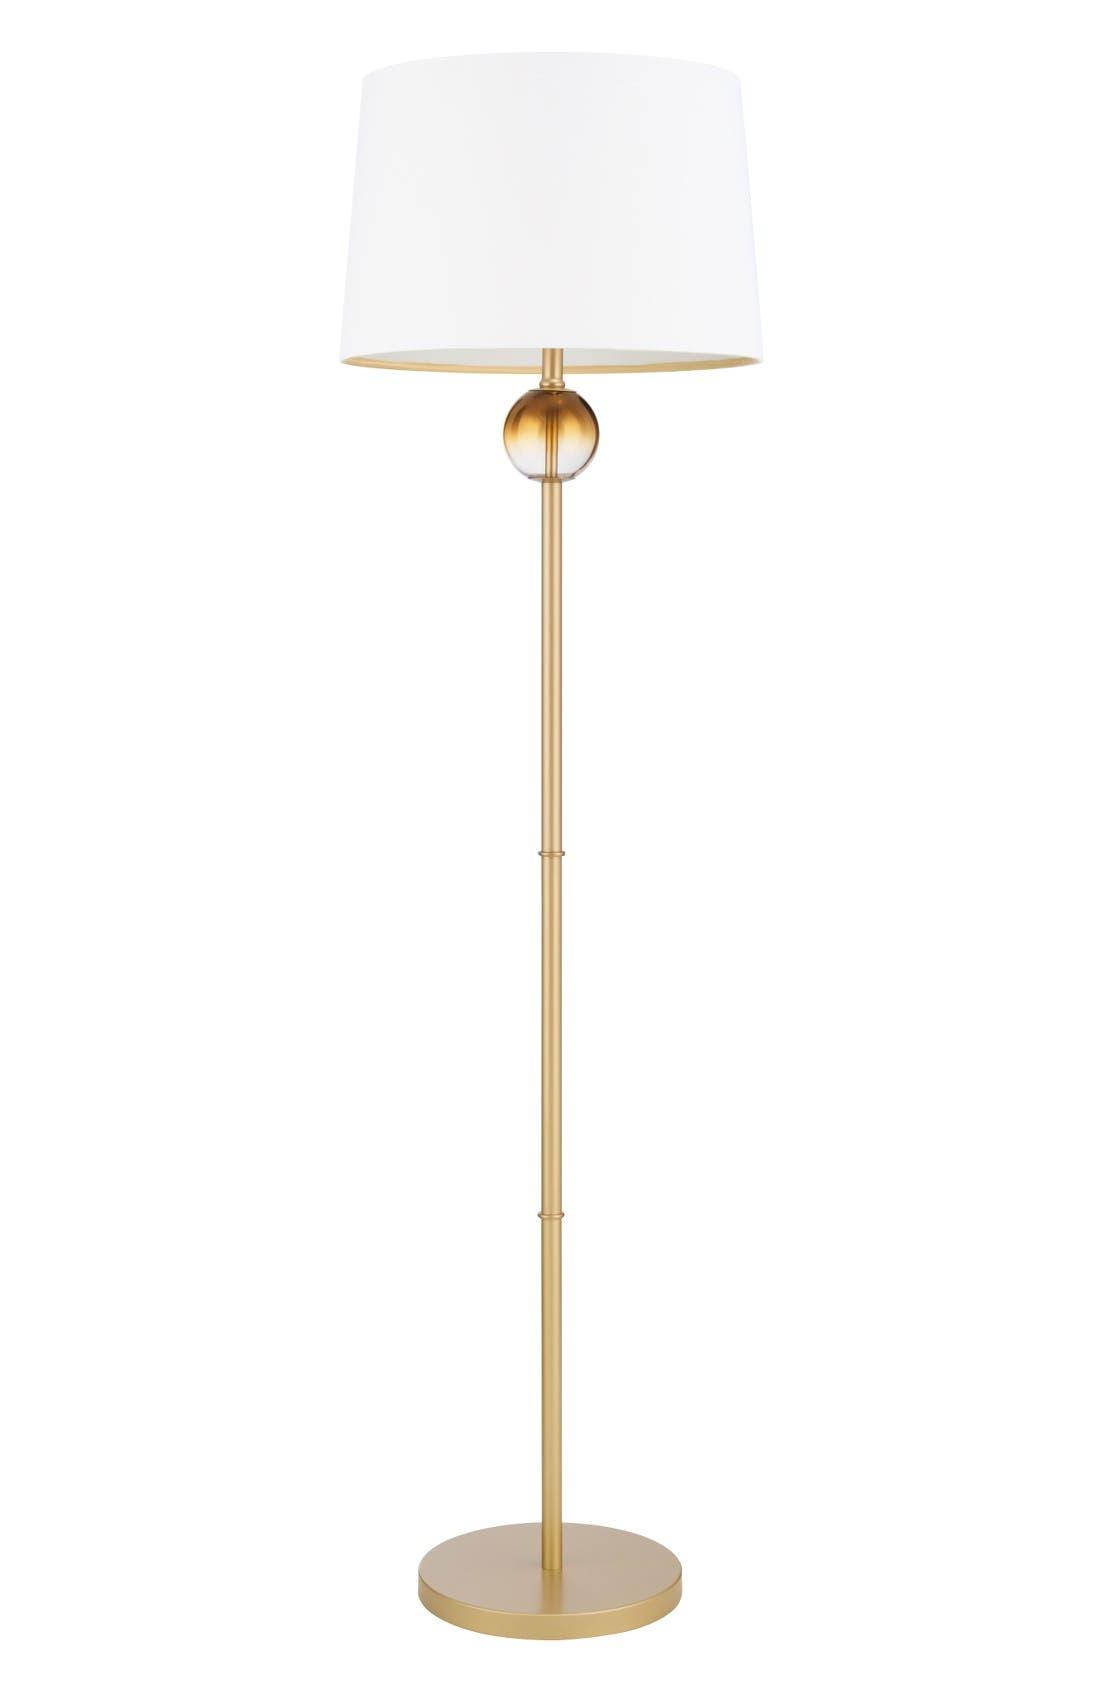 Ombré Ball Floor Lamp,                             Main thumbnail 1, color,                             Metallic Gold